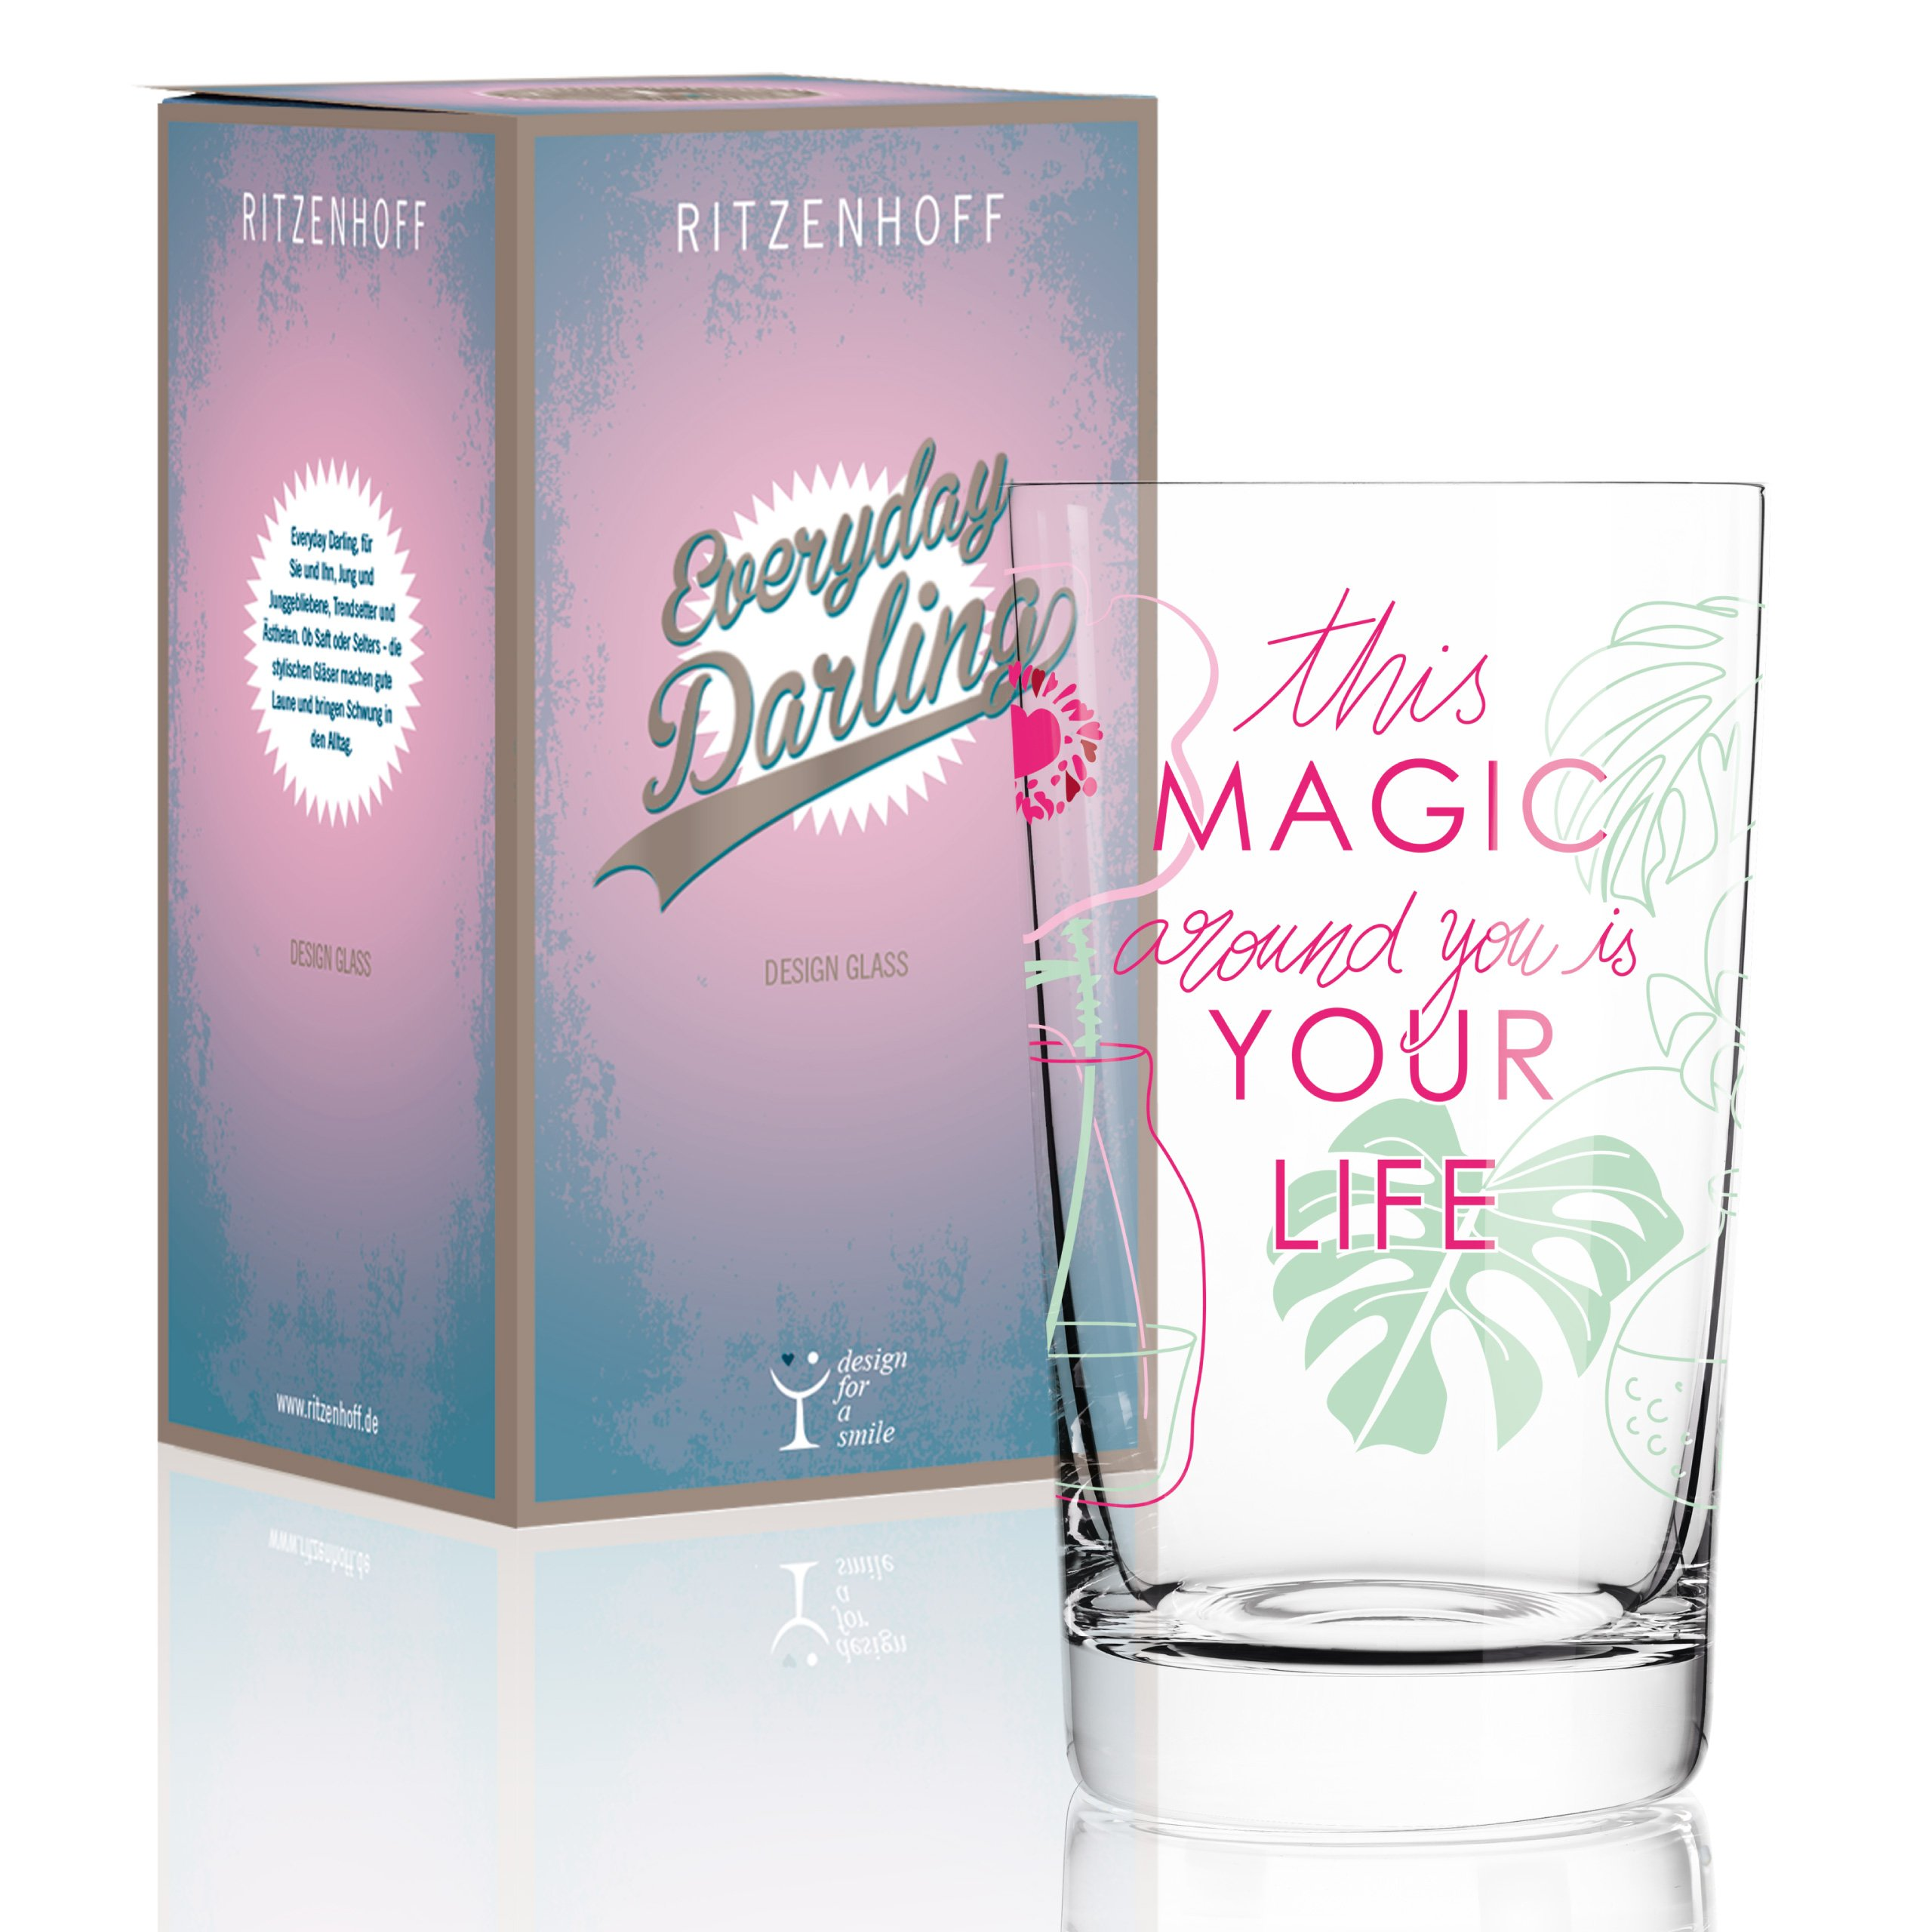 Ritzenhoff Everyday Darling Softdrinkglas, Crystal, grün/rosa, 7.3 x 7.3 x 12.7 cm